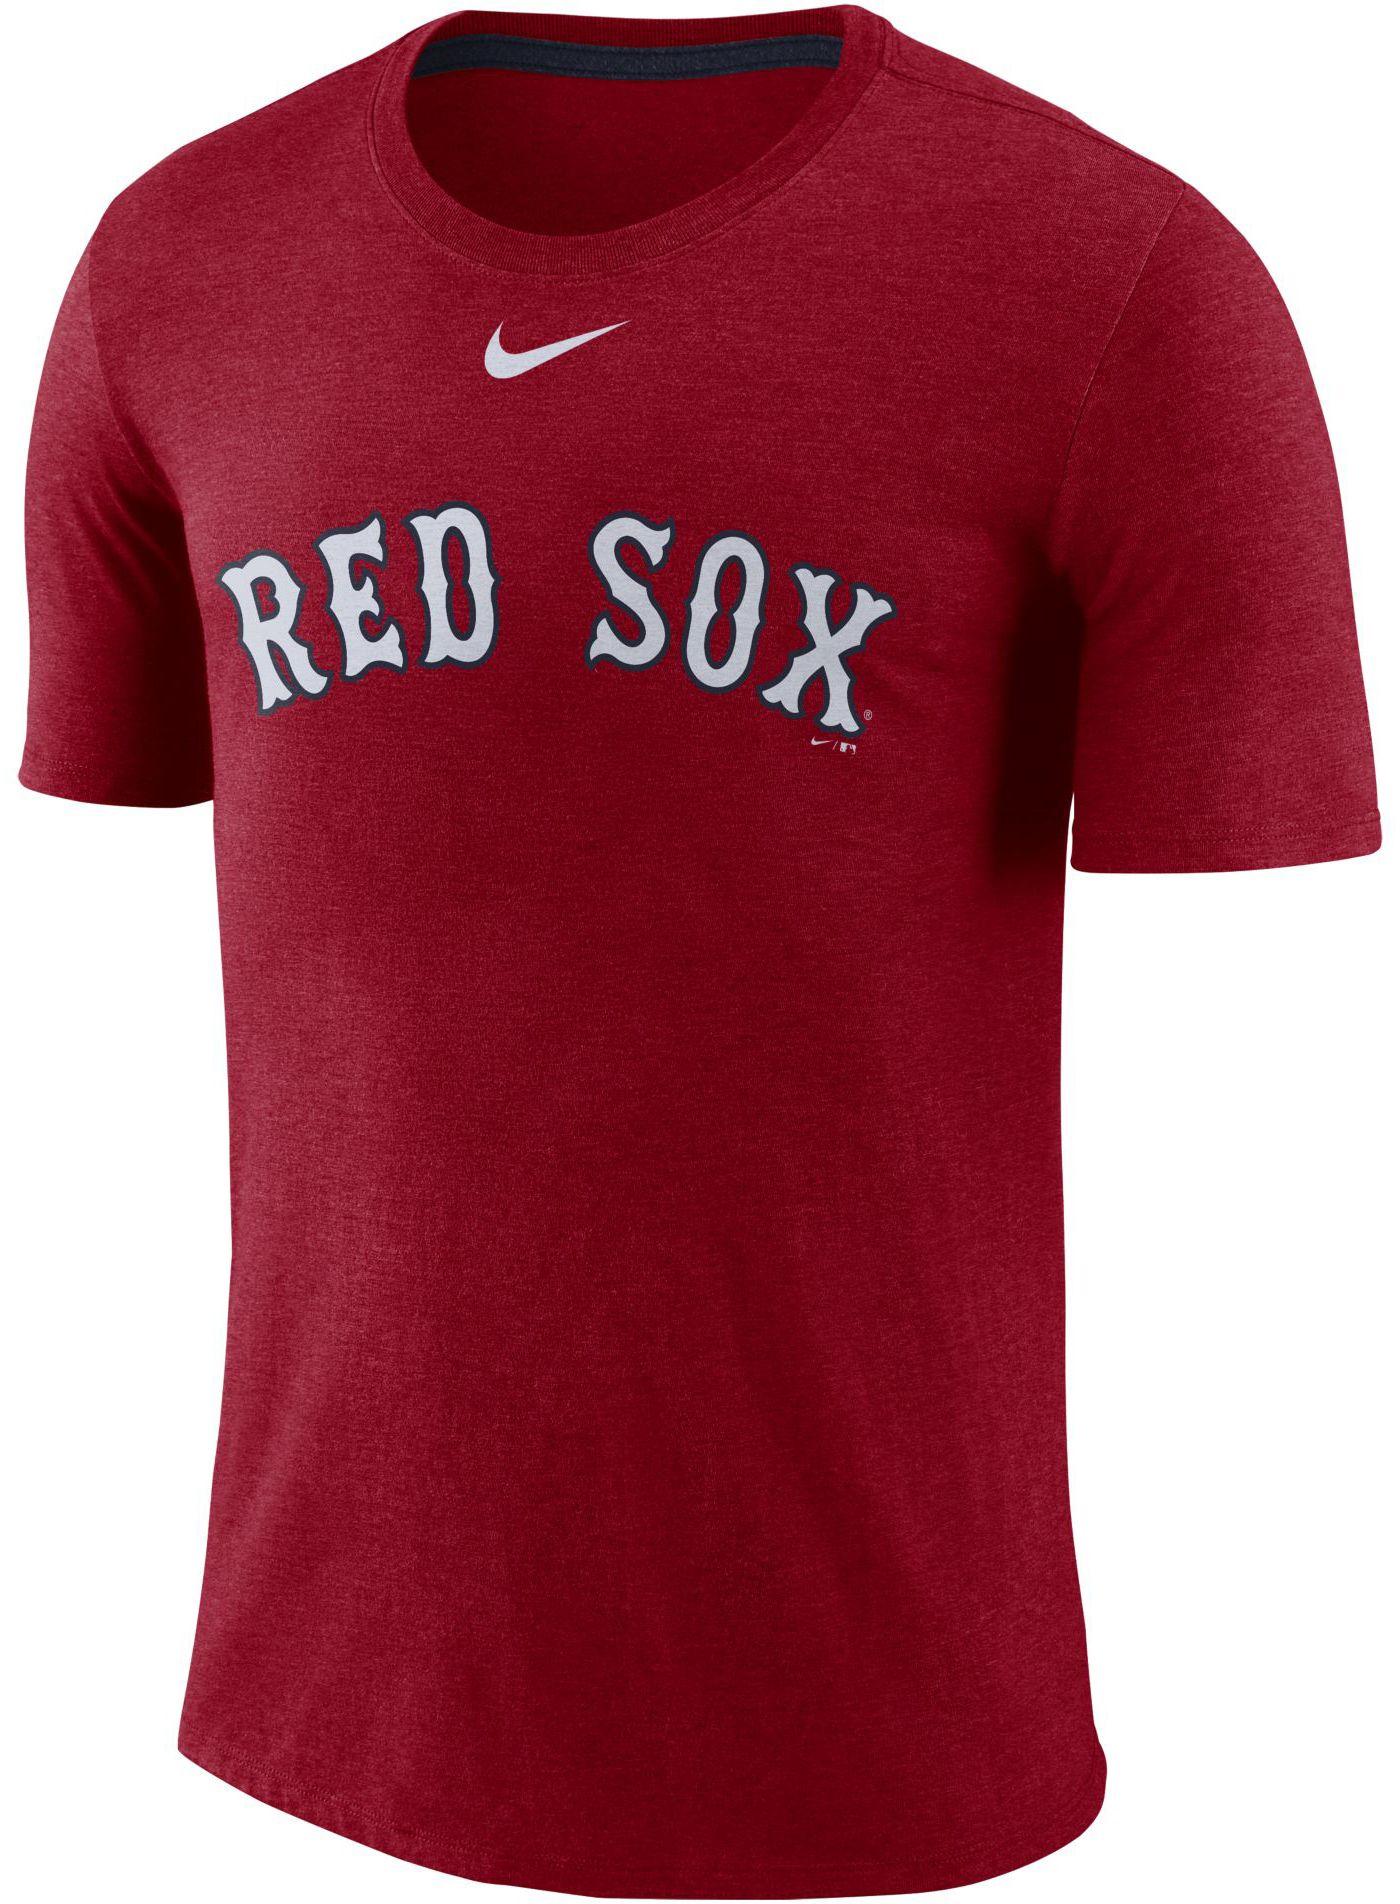 Nike Men's Boston Red Sox Tri-Blend T-Shirt